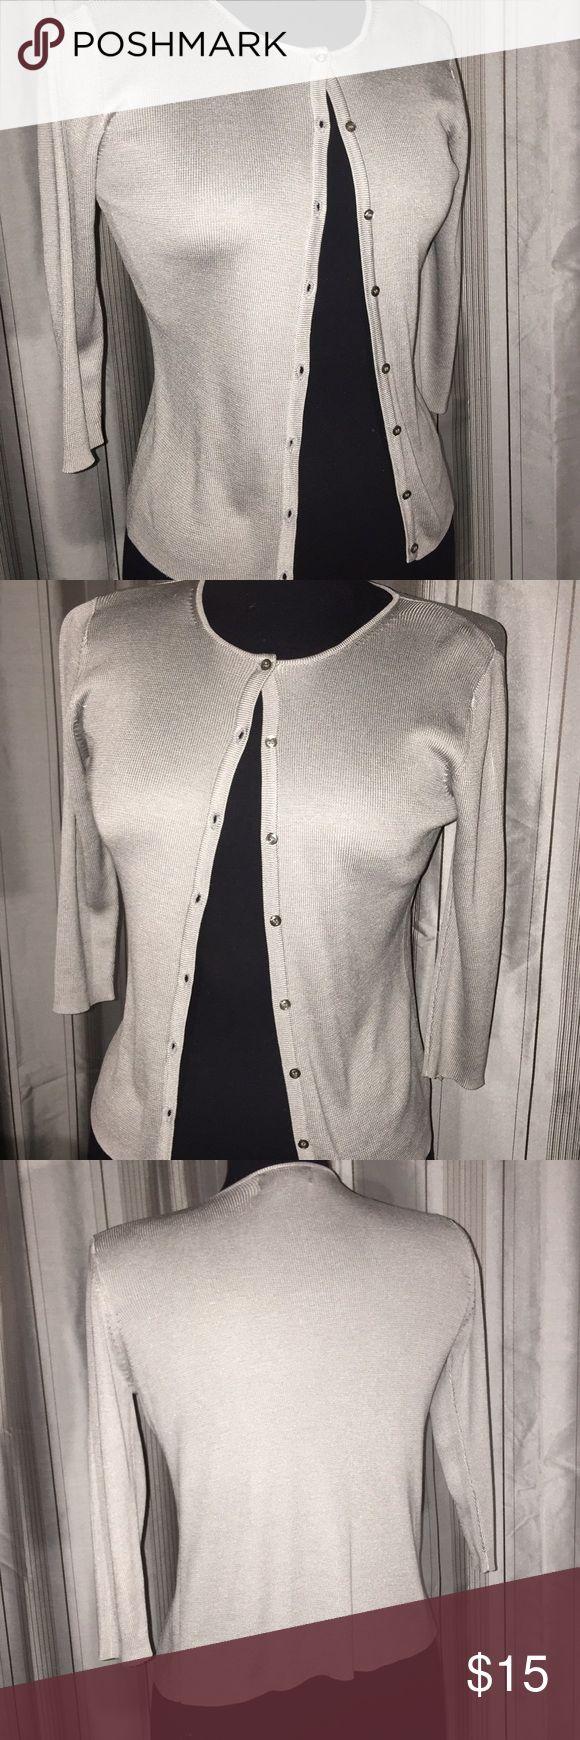 Banana Republic Silver Cardigan  💚❤️Host Pick❤️💚 Beautiful 100% silk silver Cardigan by Banana Republic is a size XS. Host pick on 12/11!! Banana Republic Sweaters Cardigans